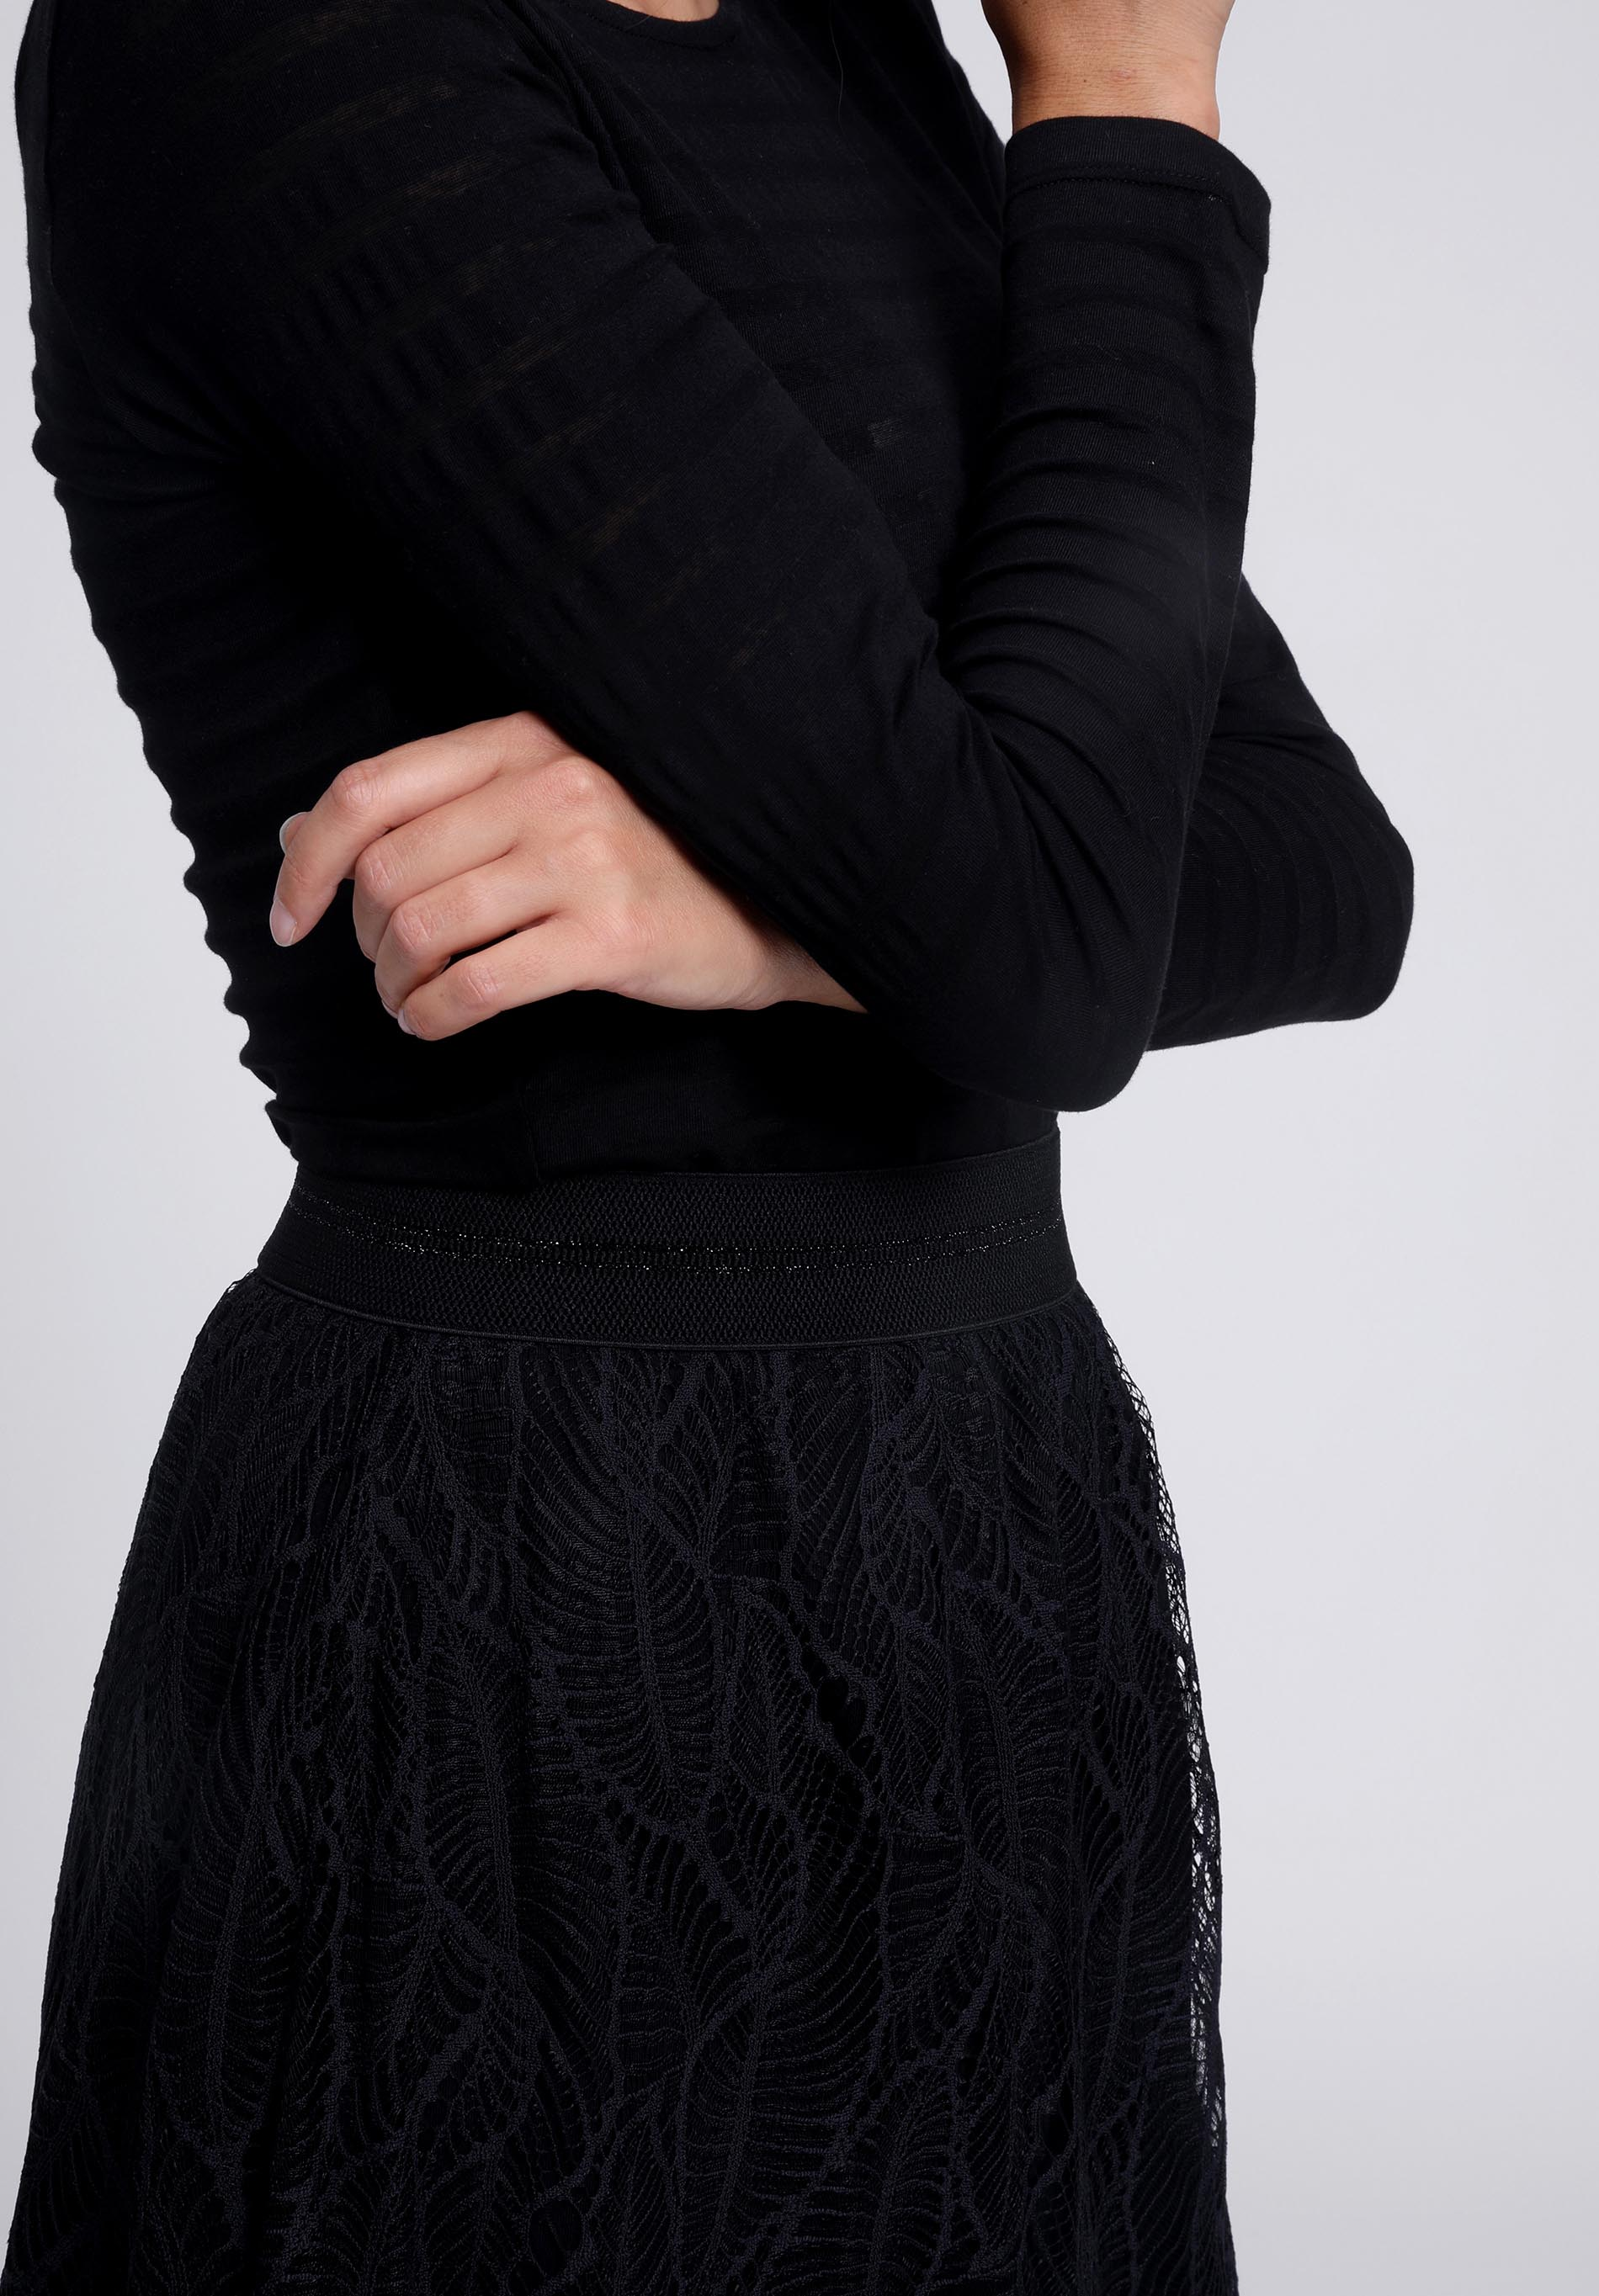 Skirt TARU black recycled Lace